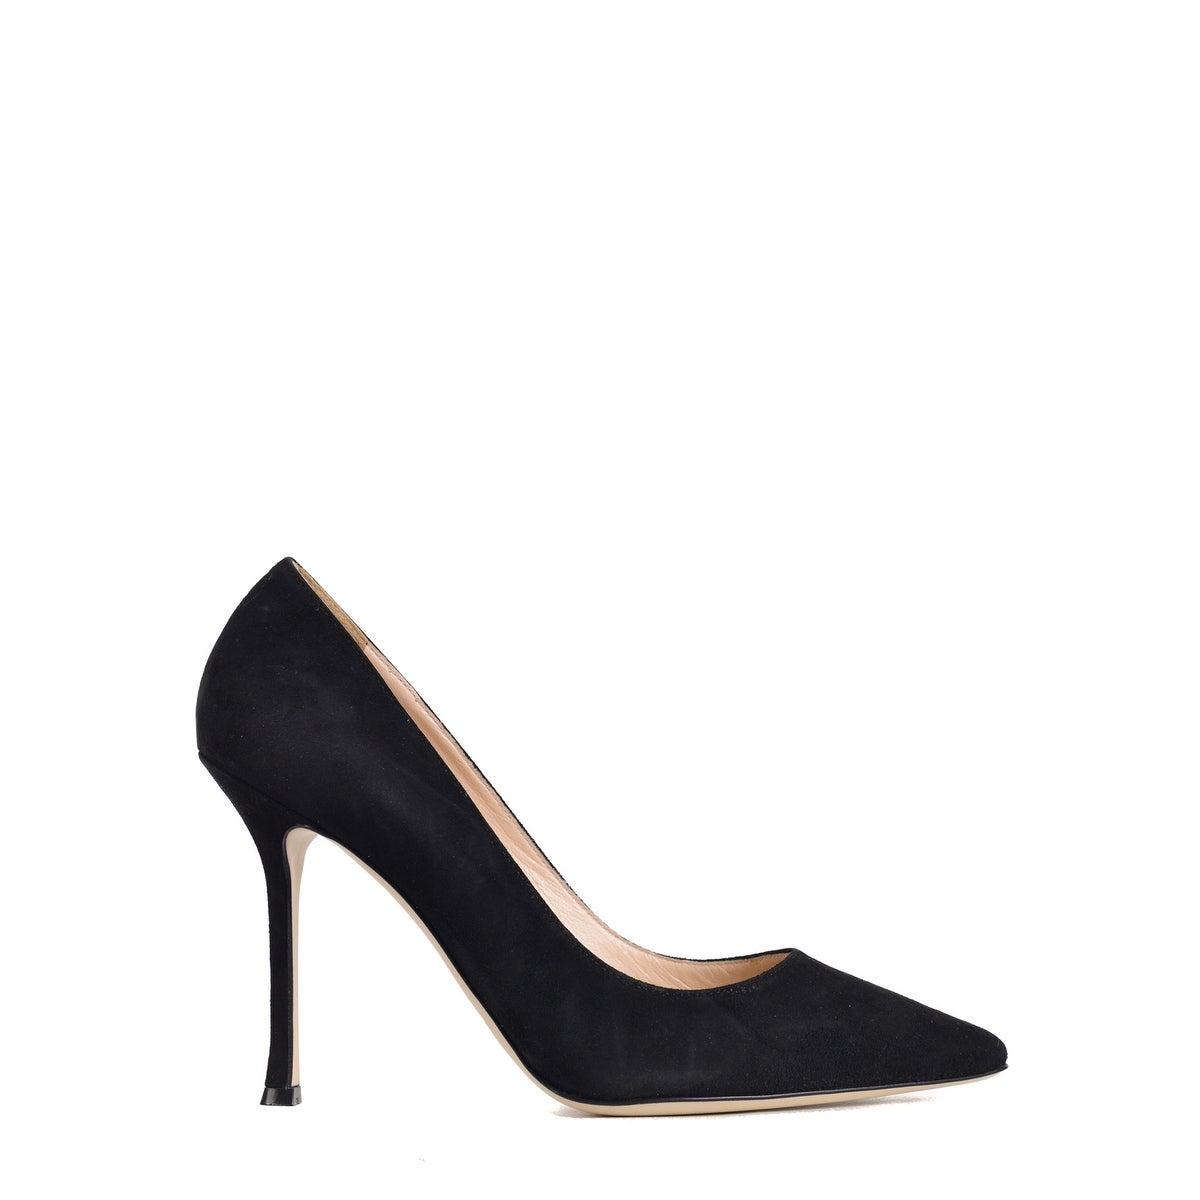 designer fashion eef27 6a16f Sergio Rossi Womens Black Suede Scarpe Donna Classic Pumps